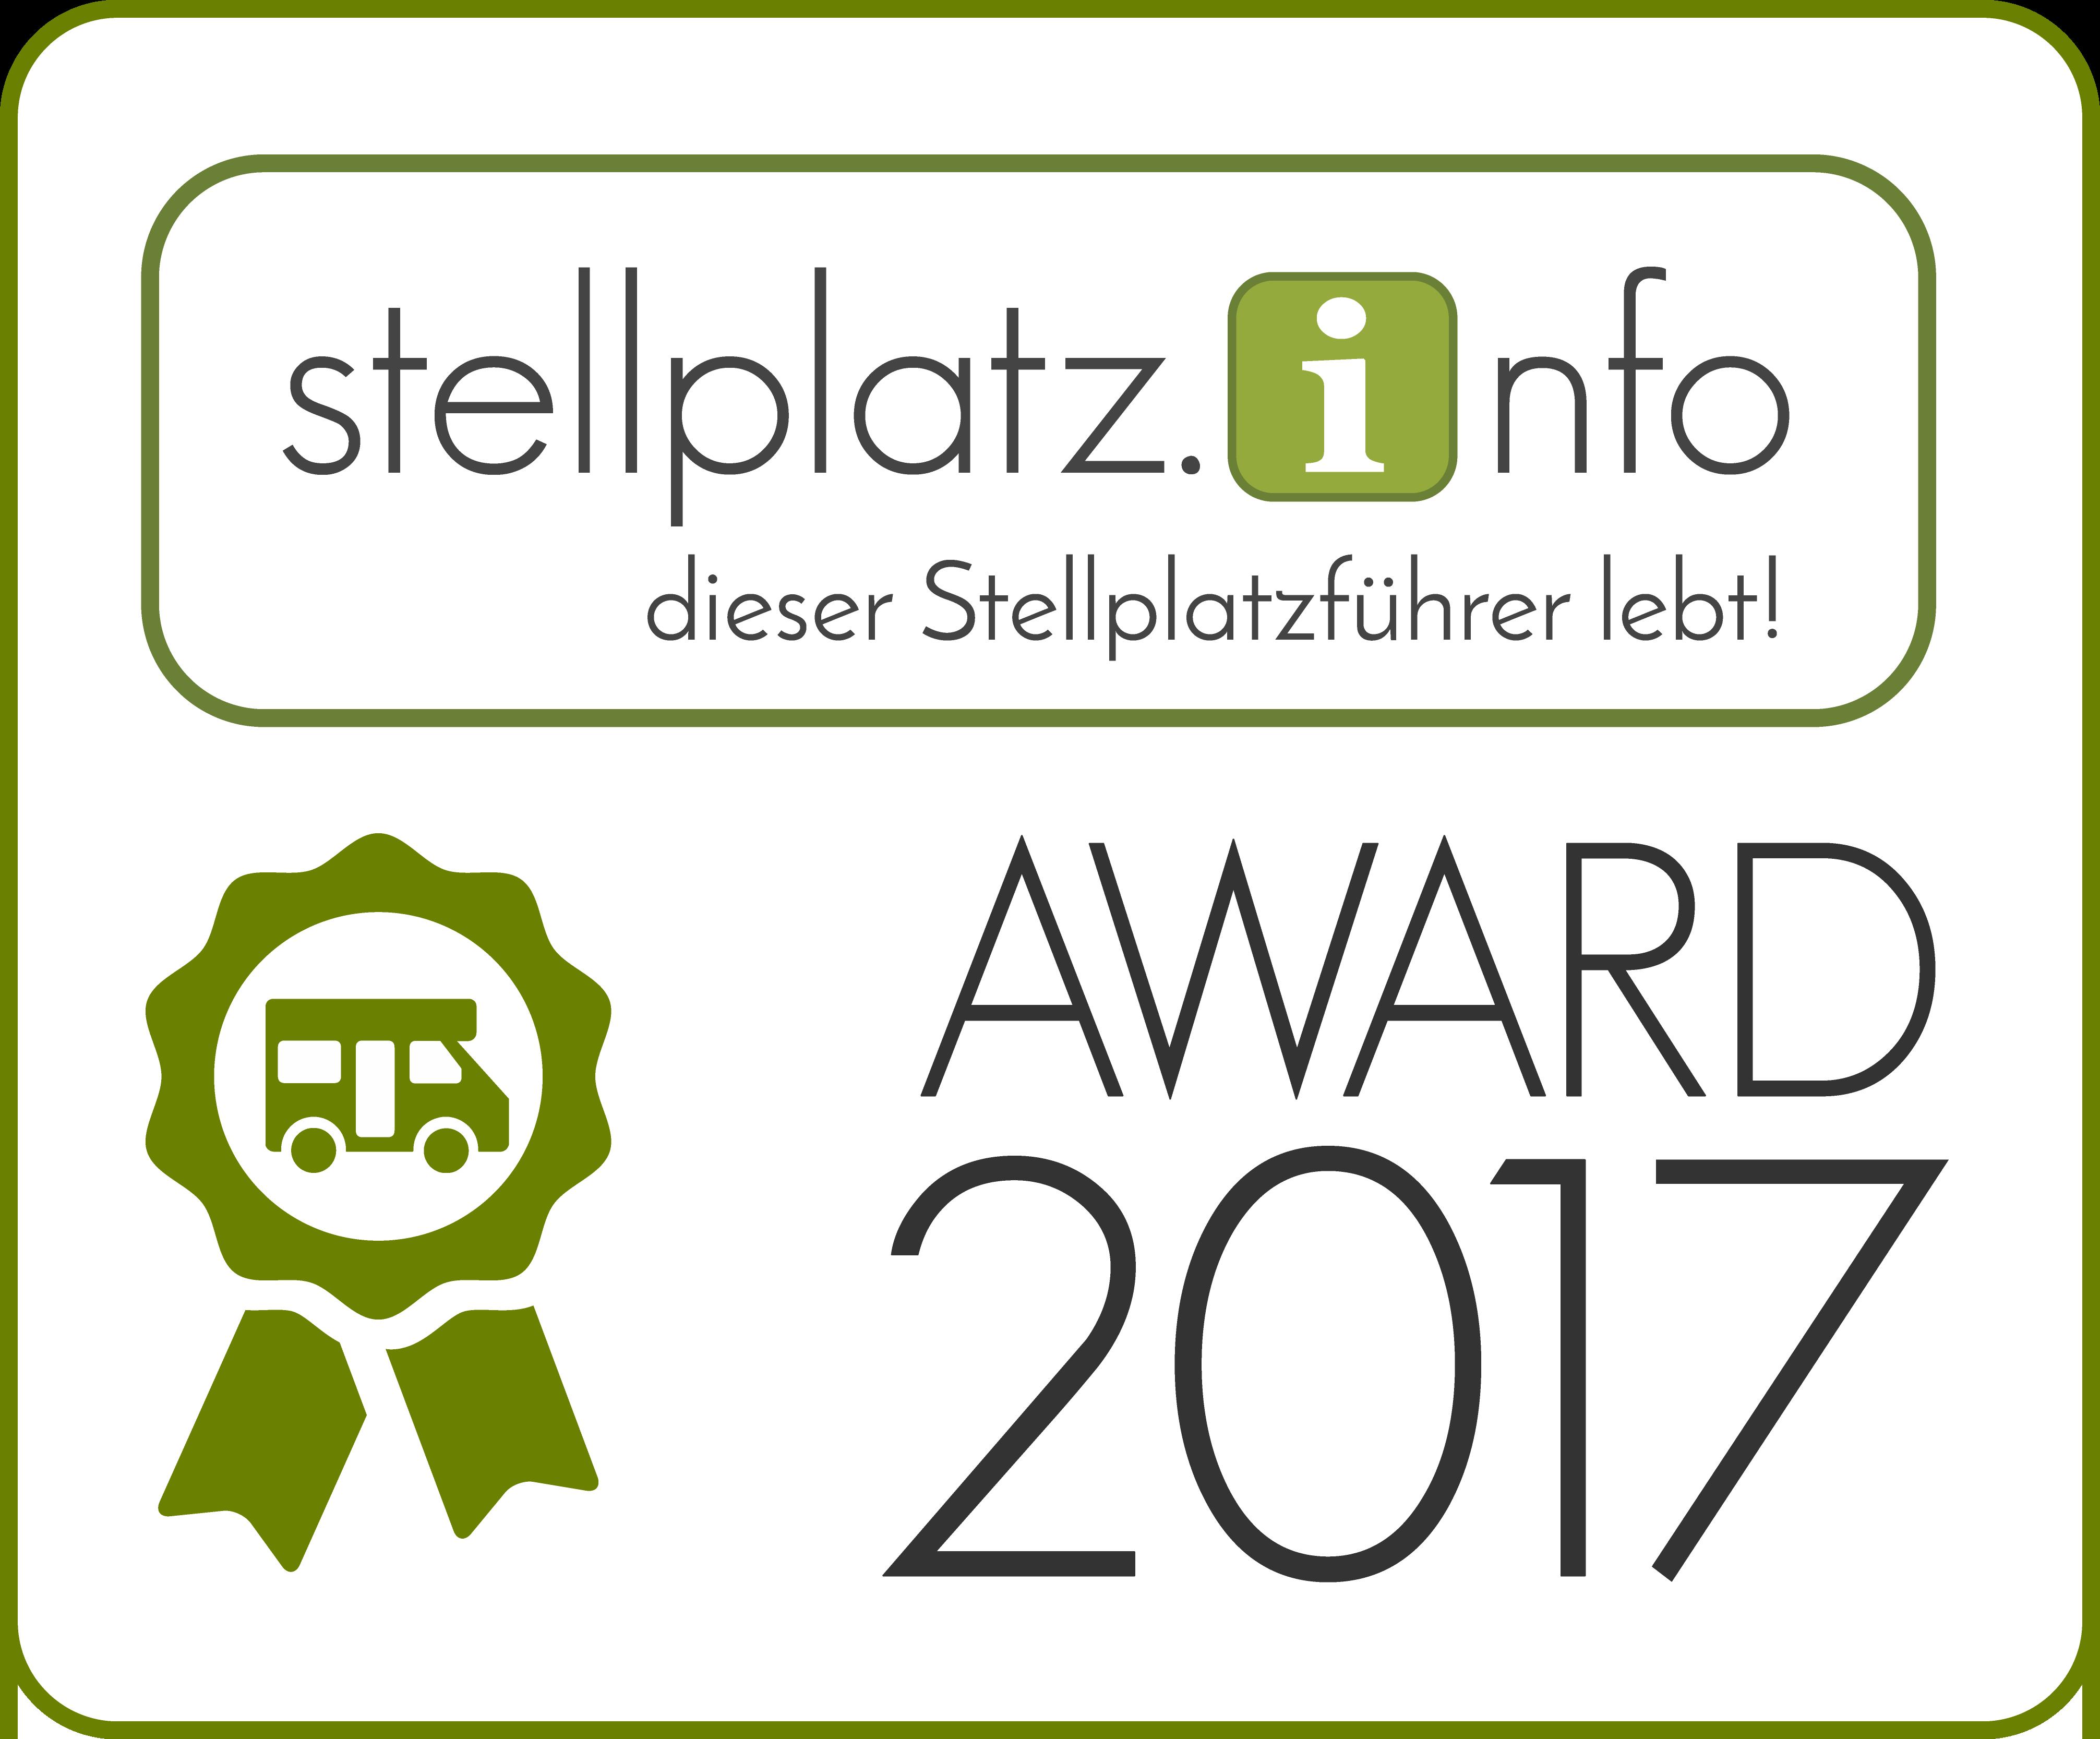 Stellplatz.info Award 2017